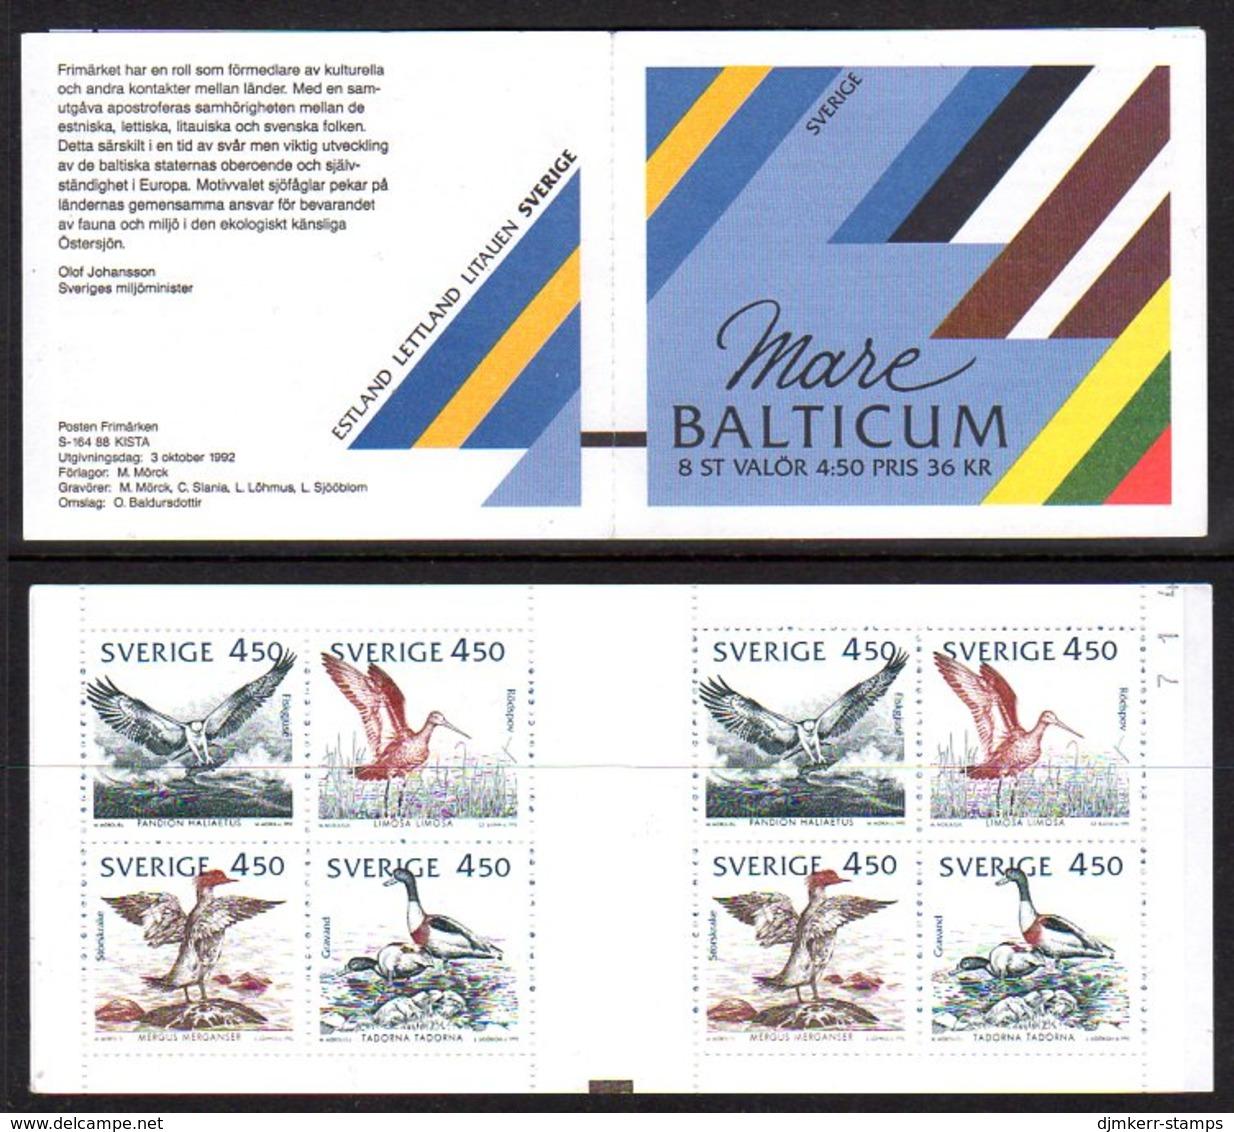 SWEDEN 1992 Birds Of The Baltic Booklet MNH / **,  Michel MH179 - Markenheftchen